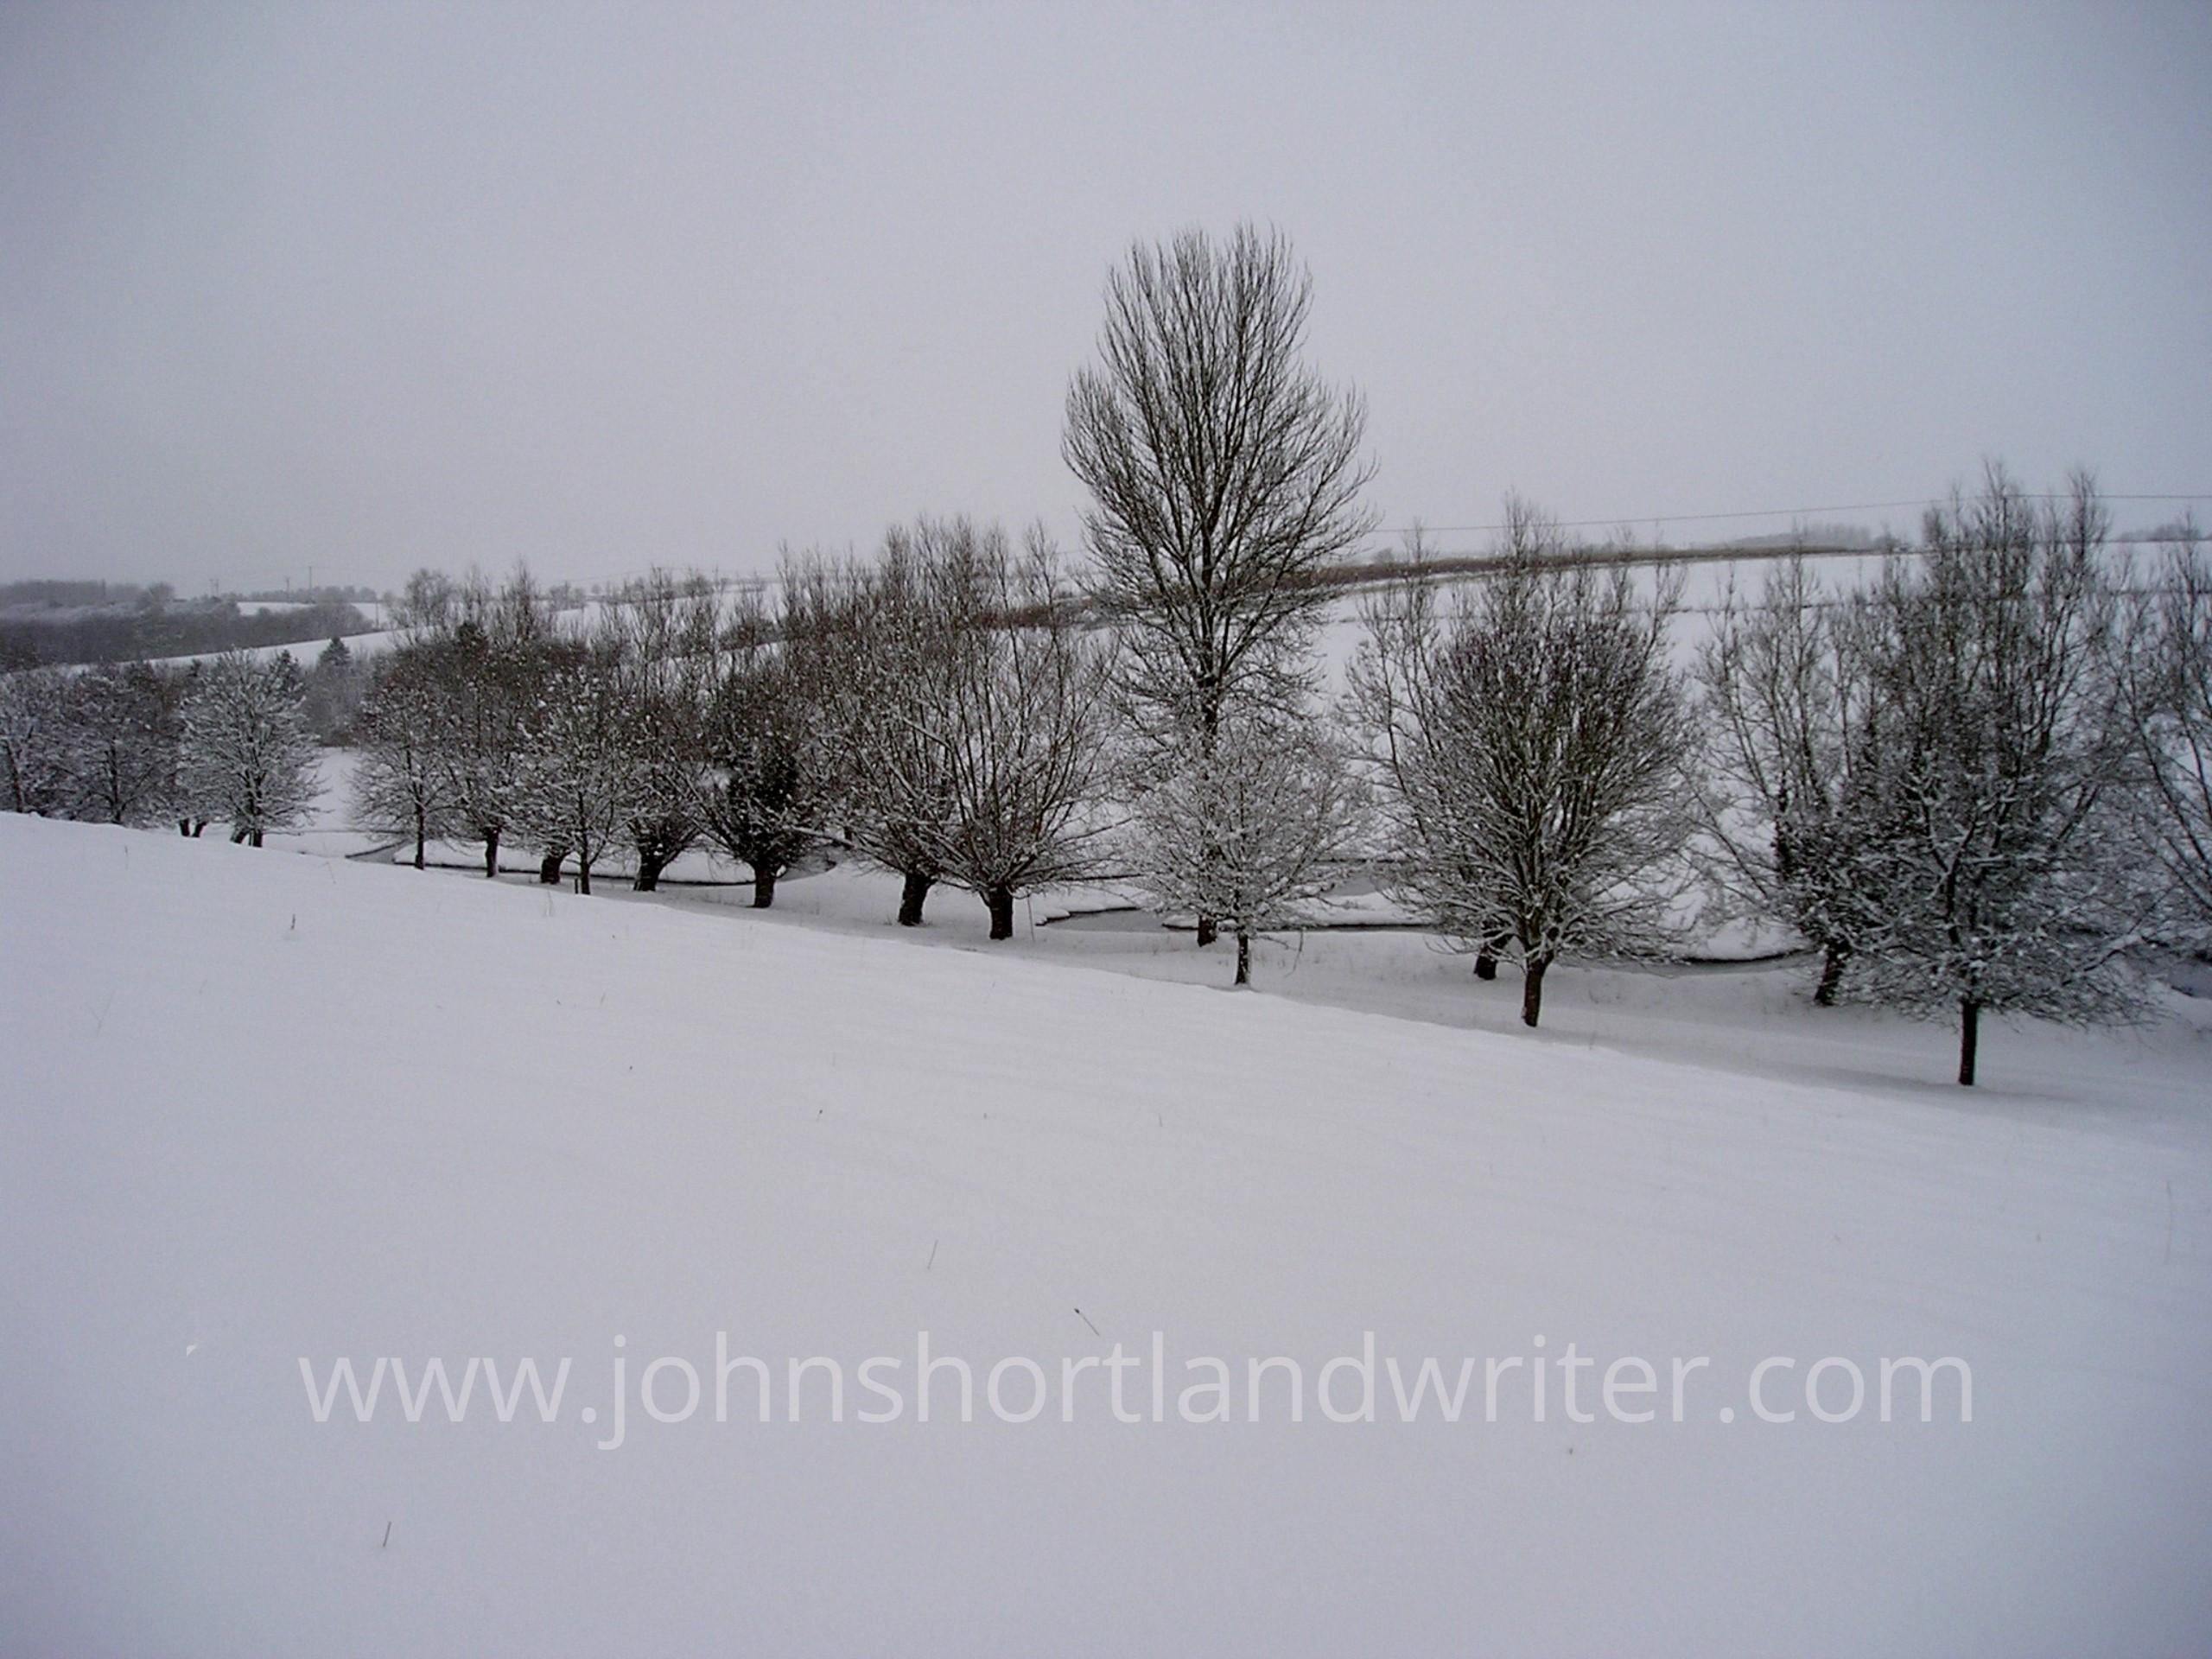 Snow 2010 (10) watermark